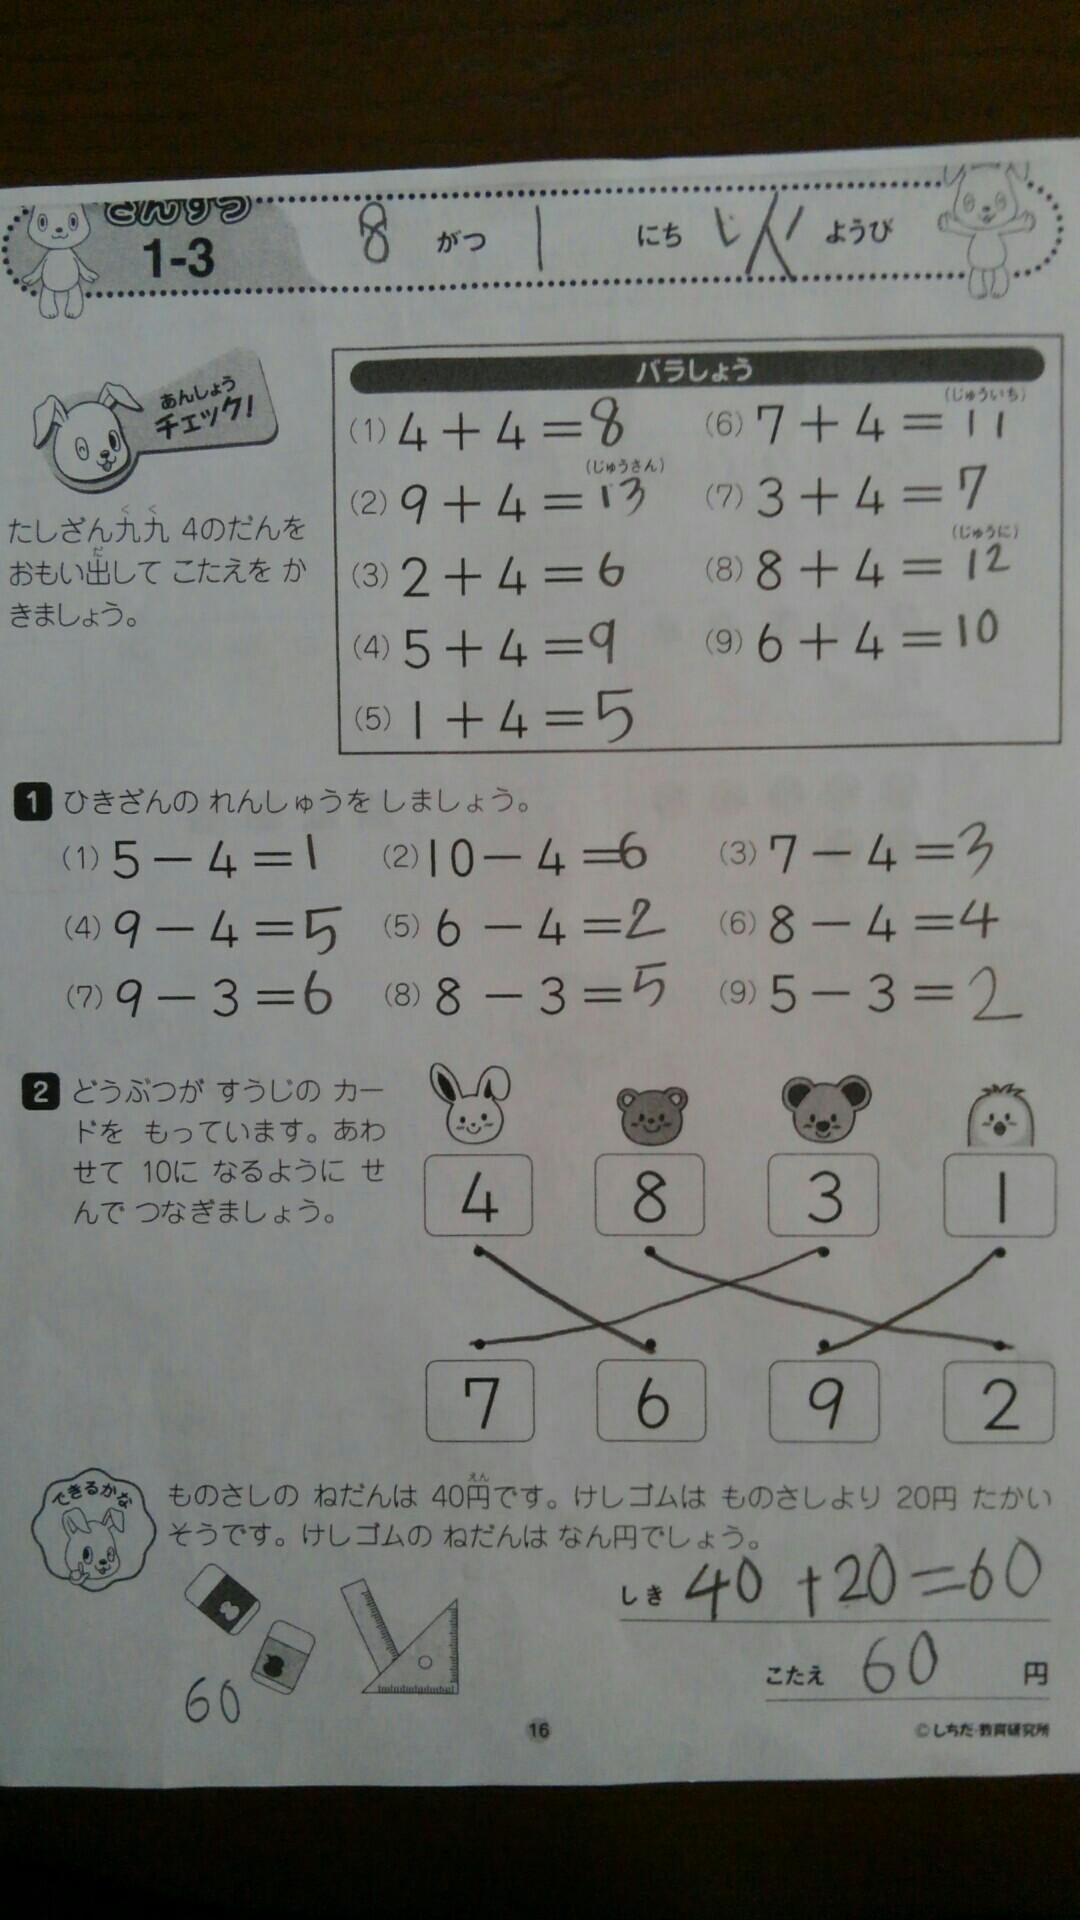 f:id:shihomaru:20170805074213j:image